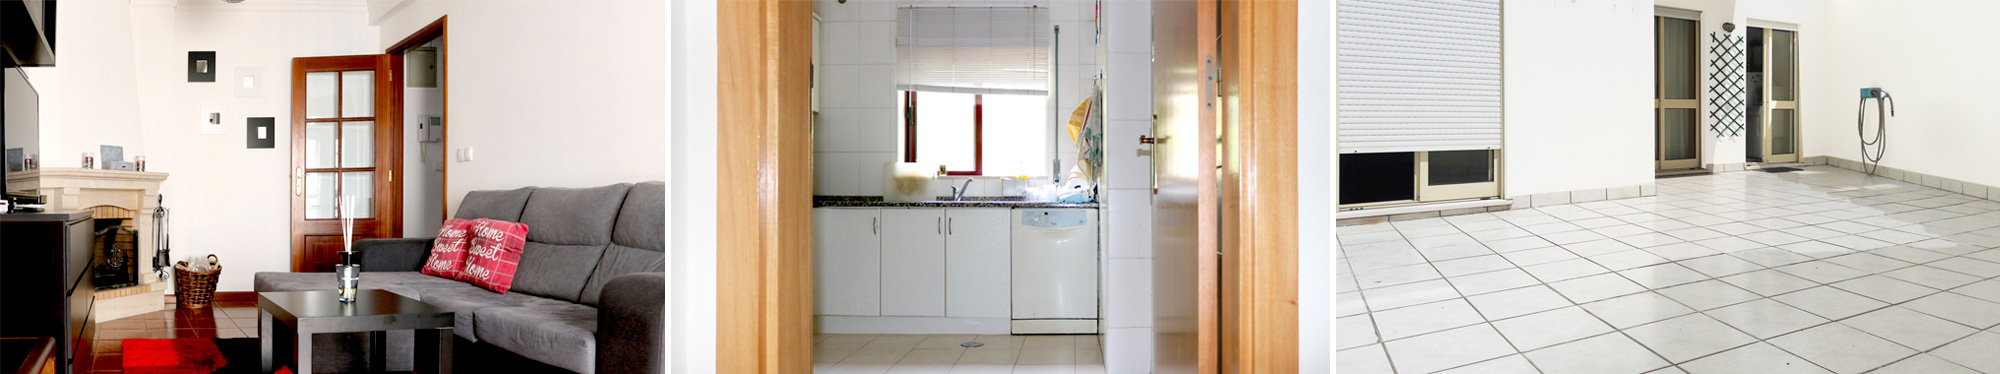 apartamentos-baratos-aveiro